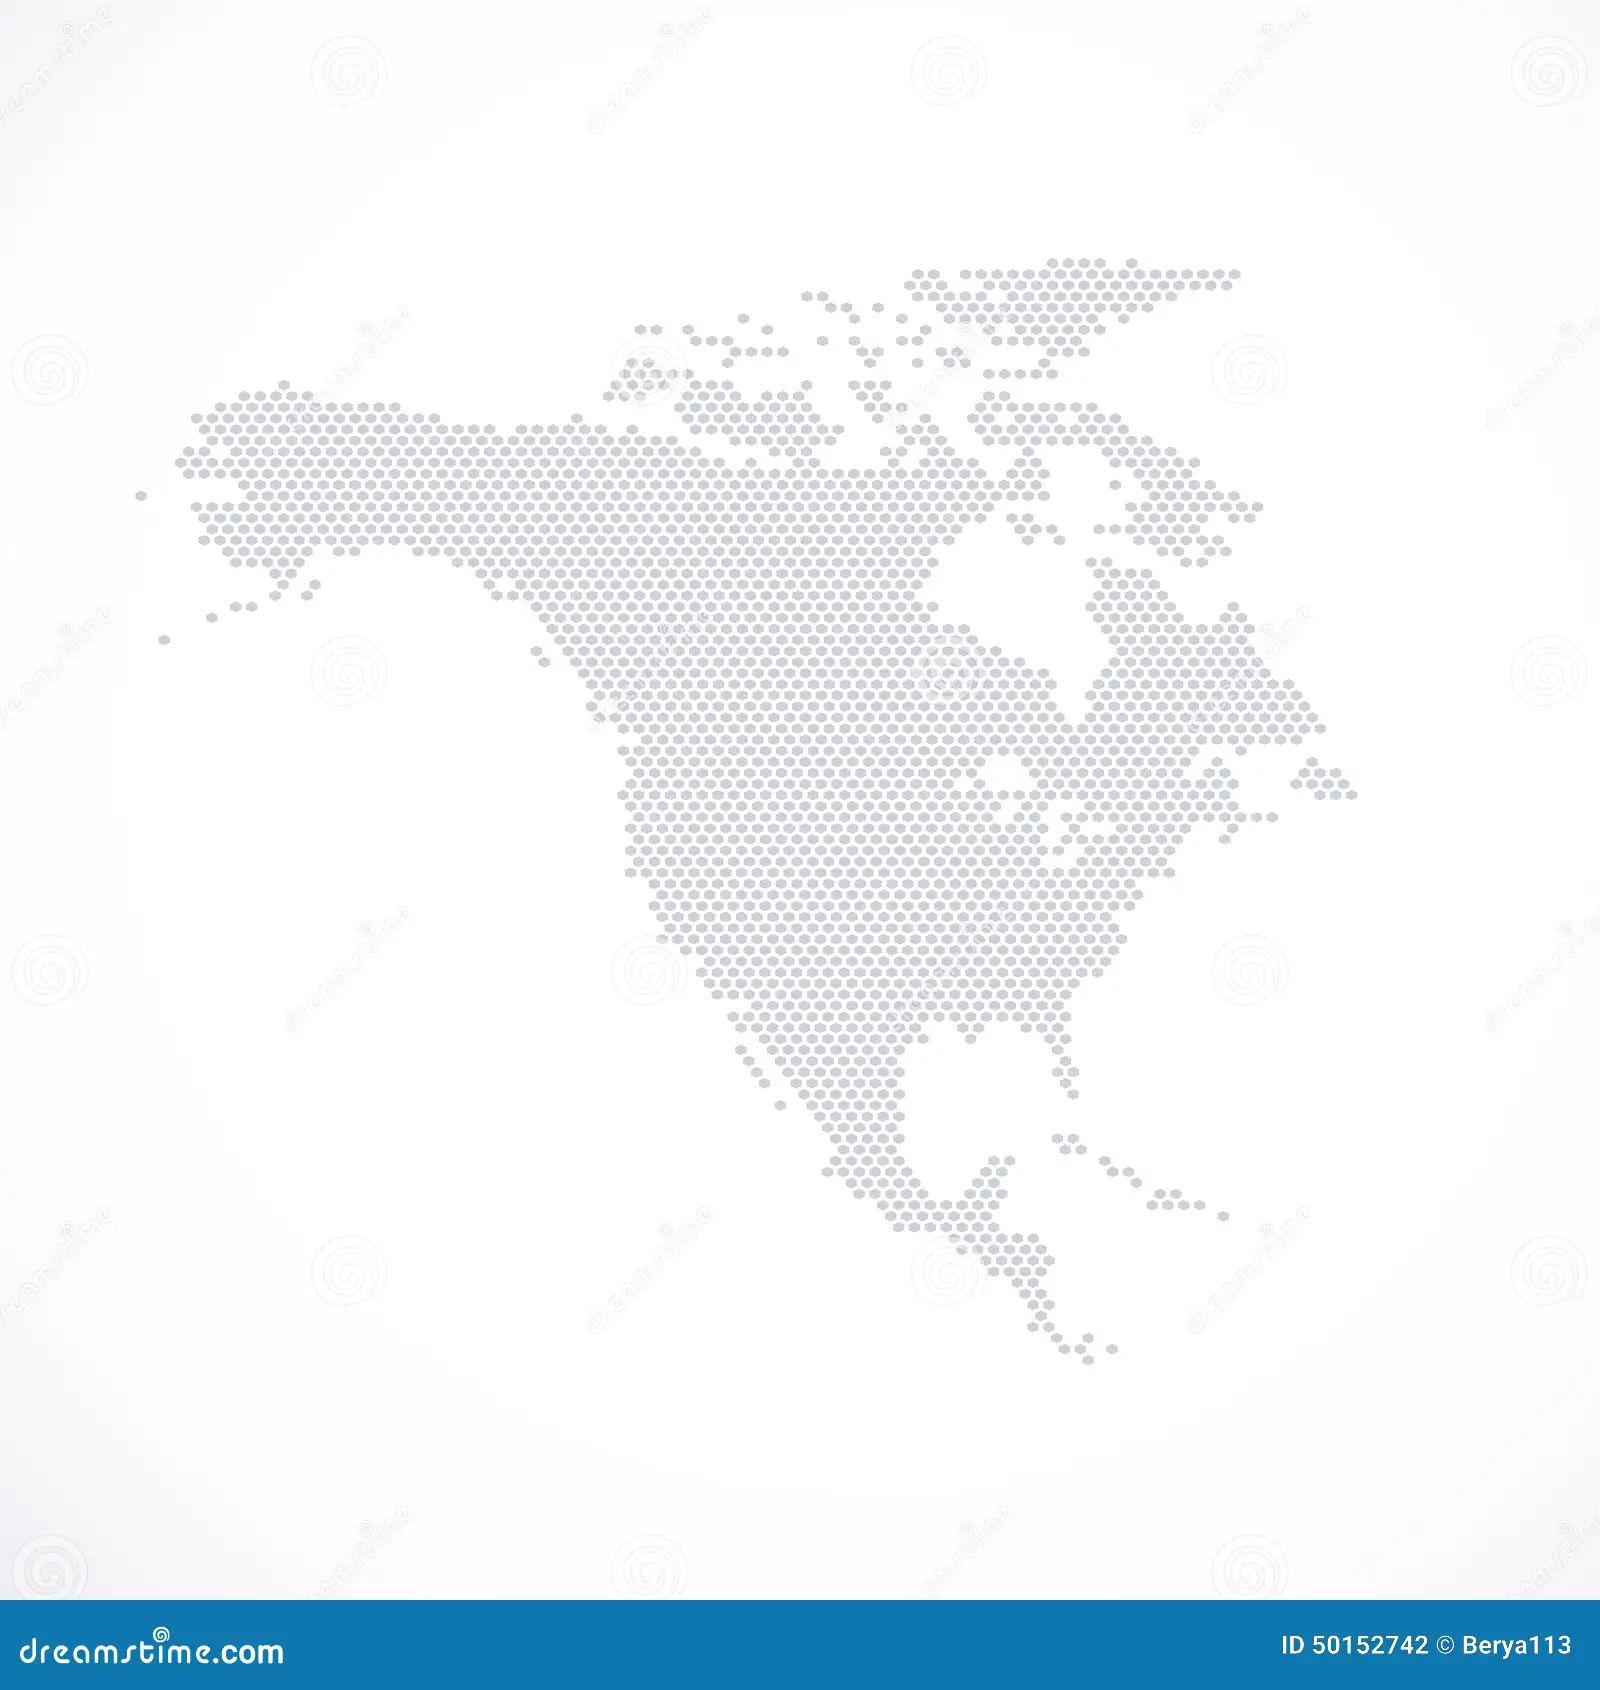 north america map clipart